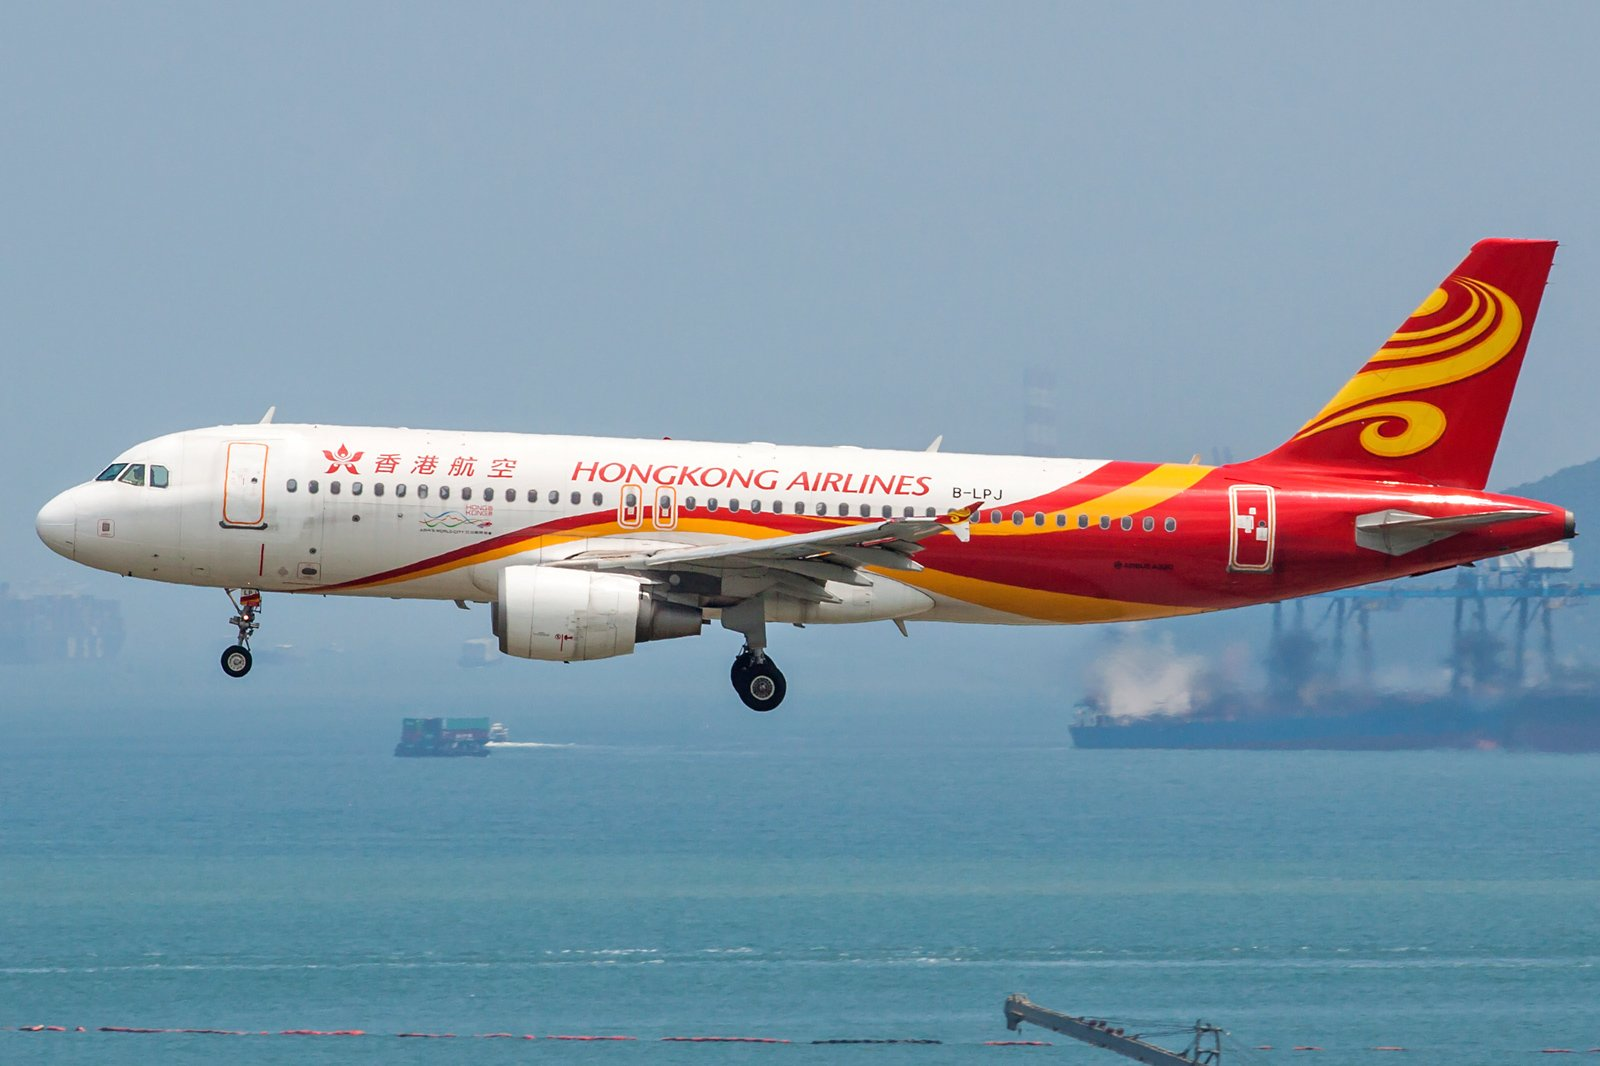 Hong Kong Airlines Airbus A320-214 B-LPJ